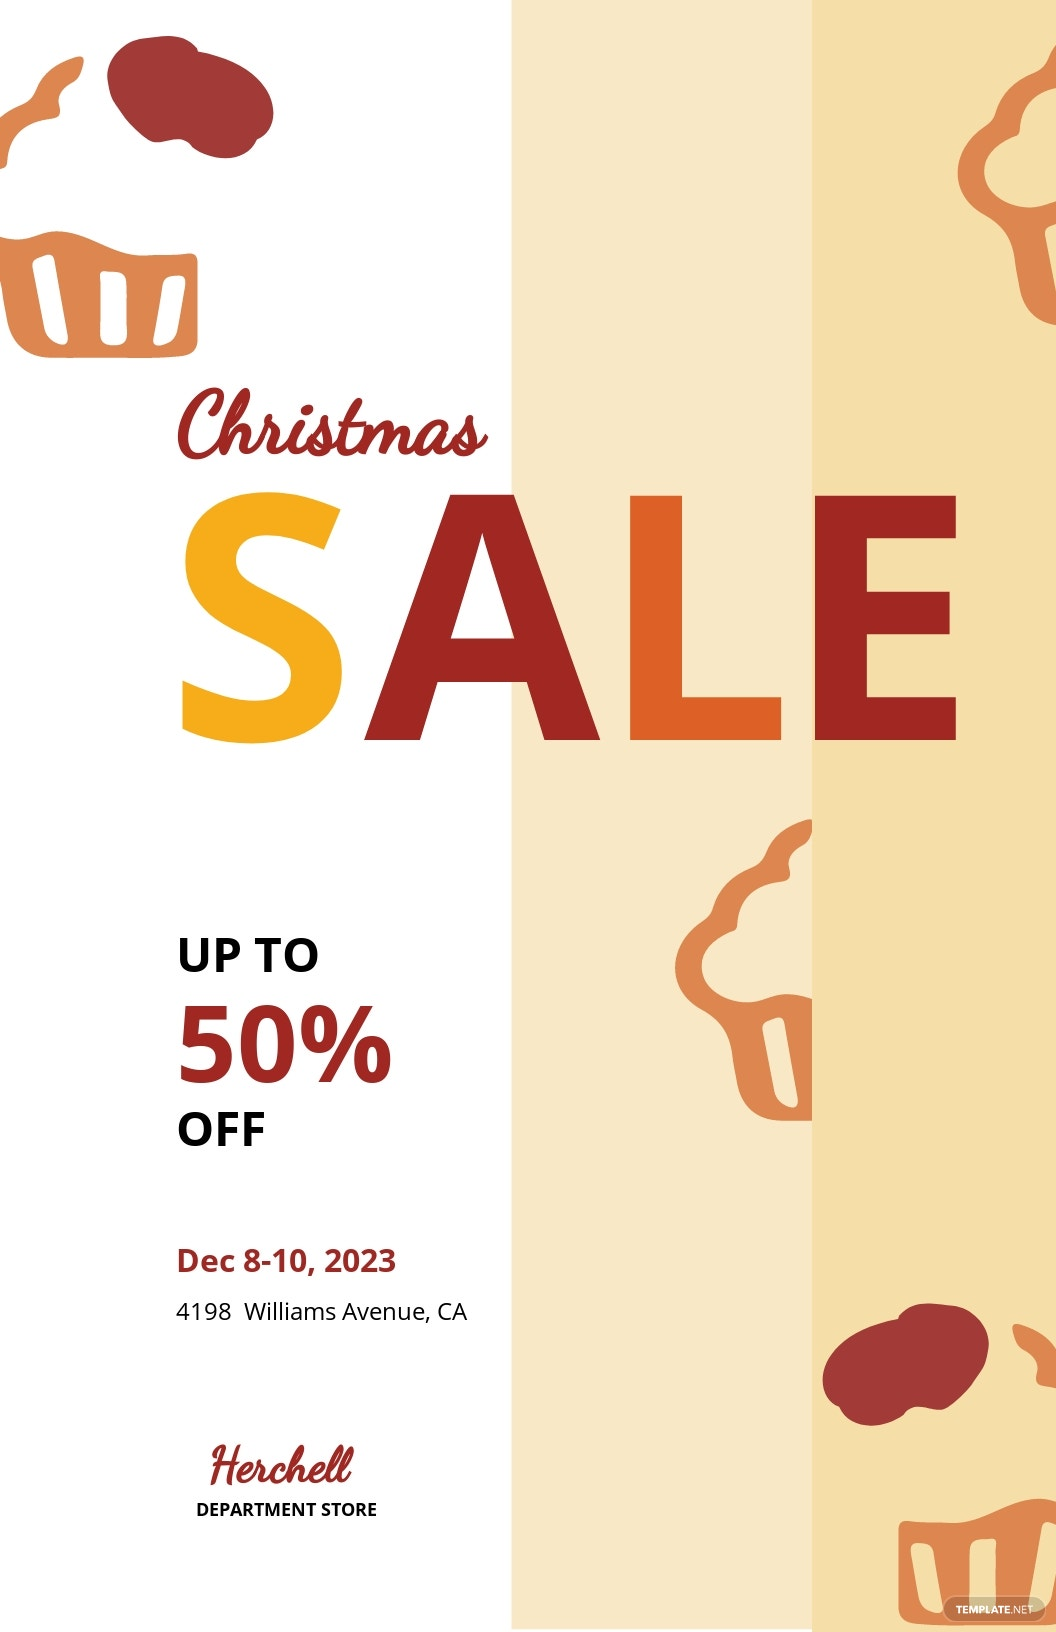 Free Christmas Bake Sale Poster Template